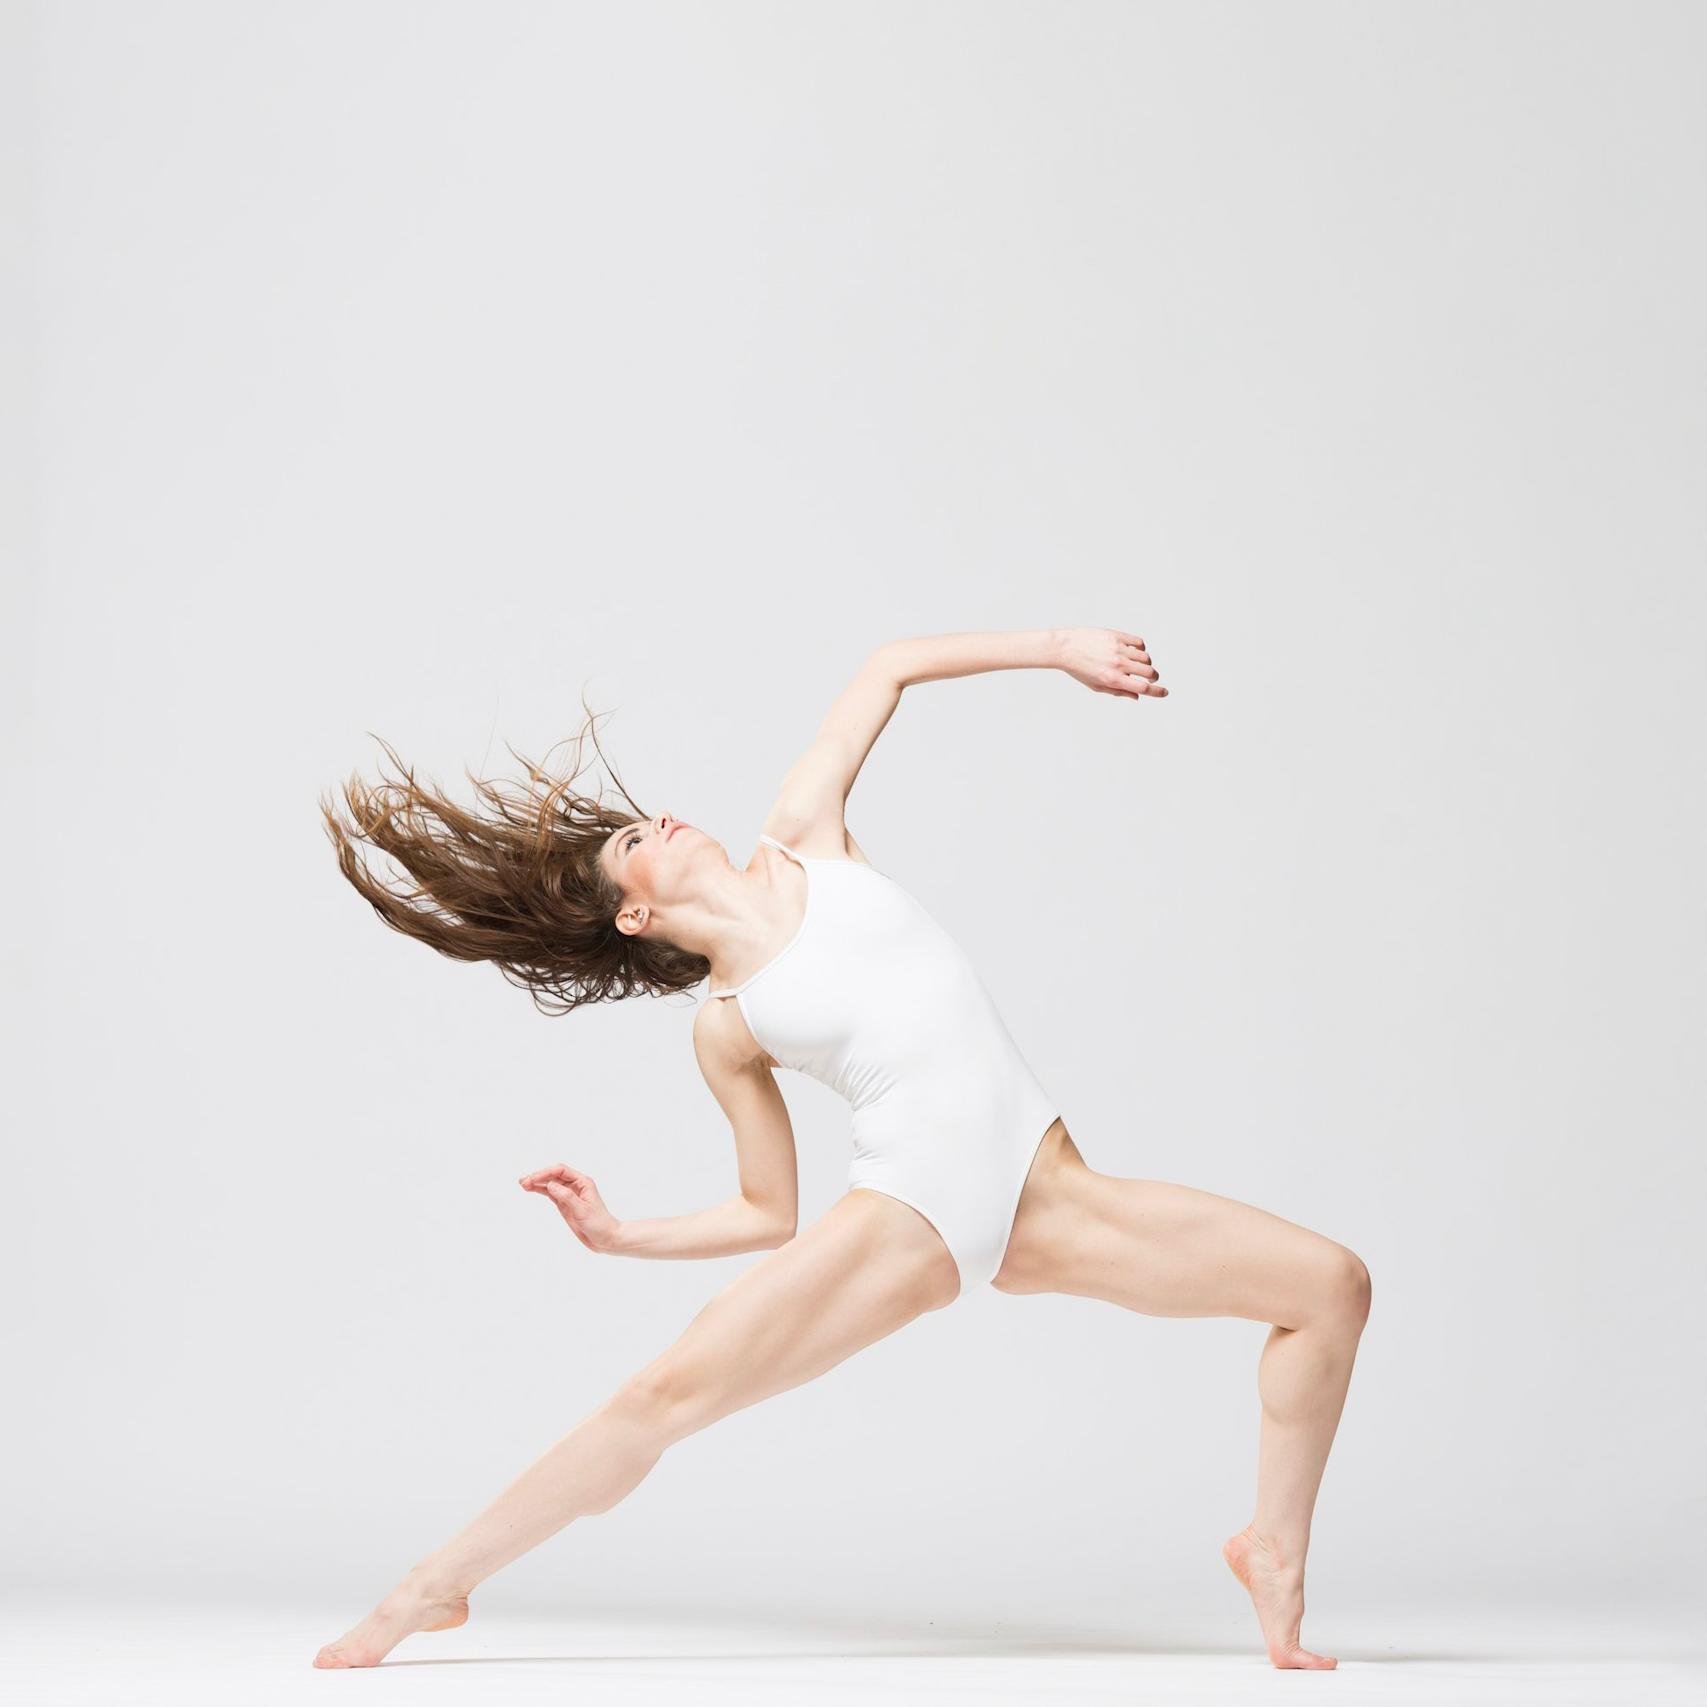 Skyler Sward for Elements Ballet photo by Topher Alexander